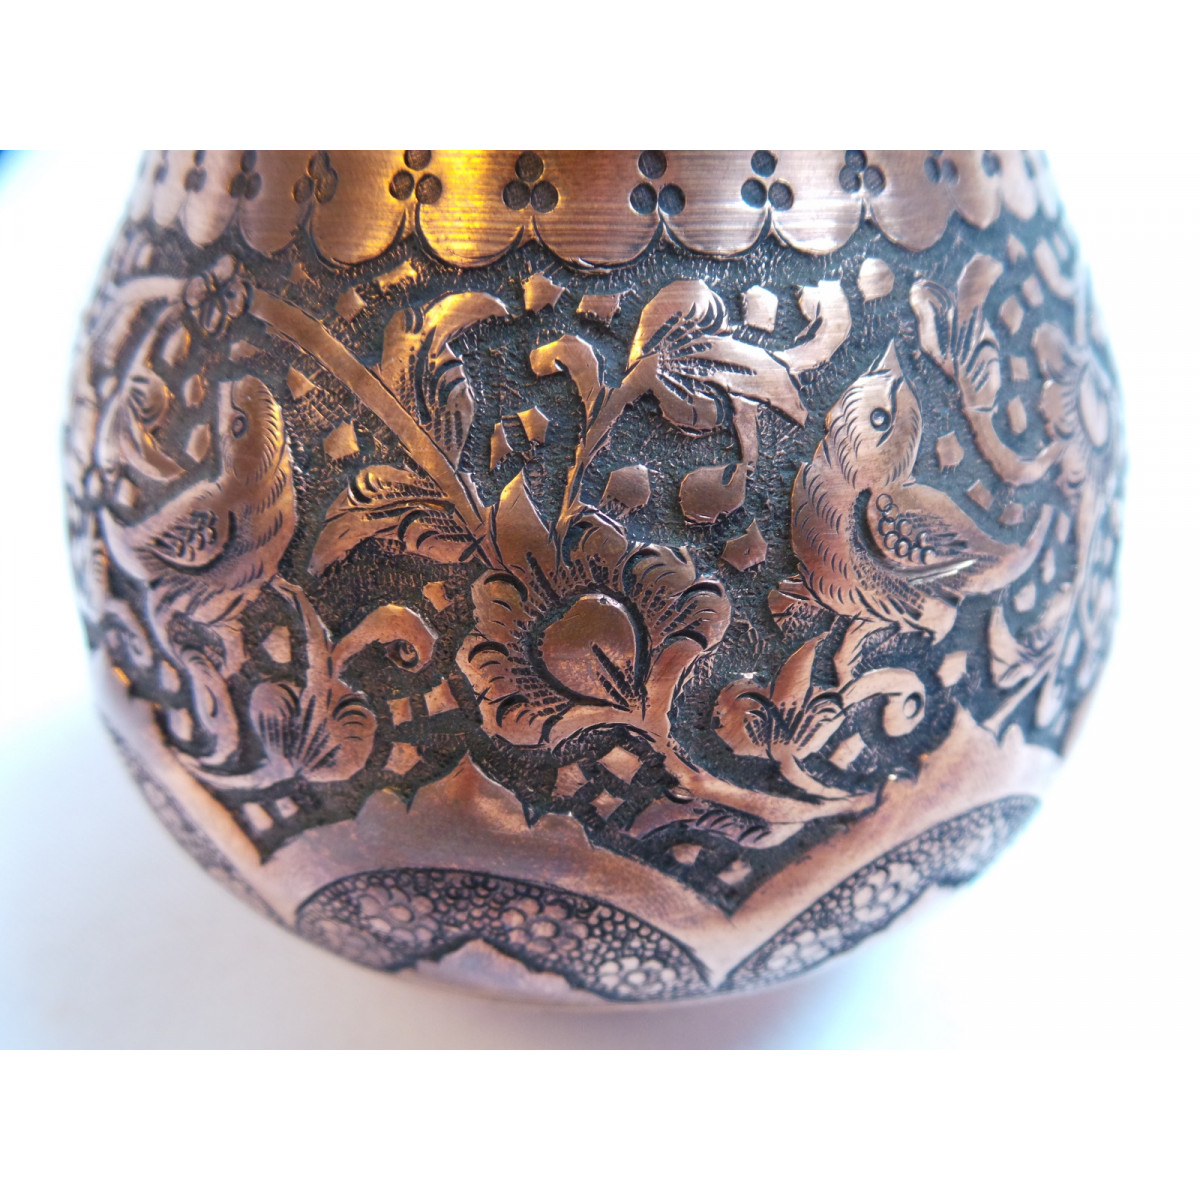 Luxury Engraved Sugar Pot/Candy Dish - HG1036-Persian Handicrafts